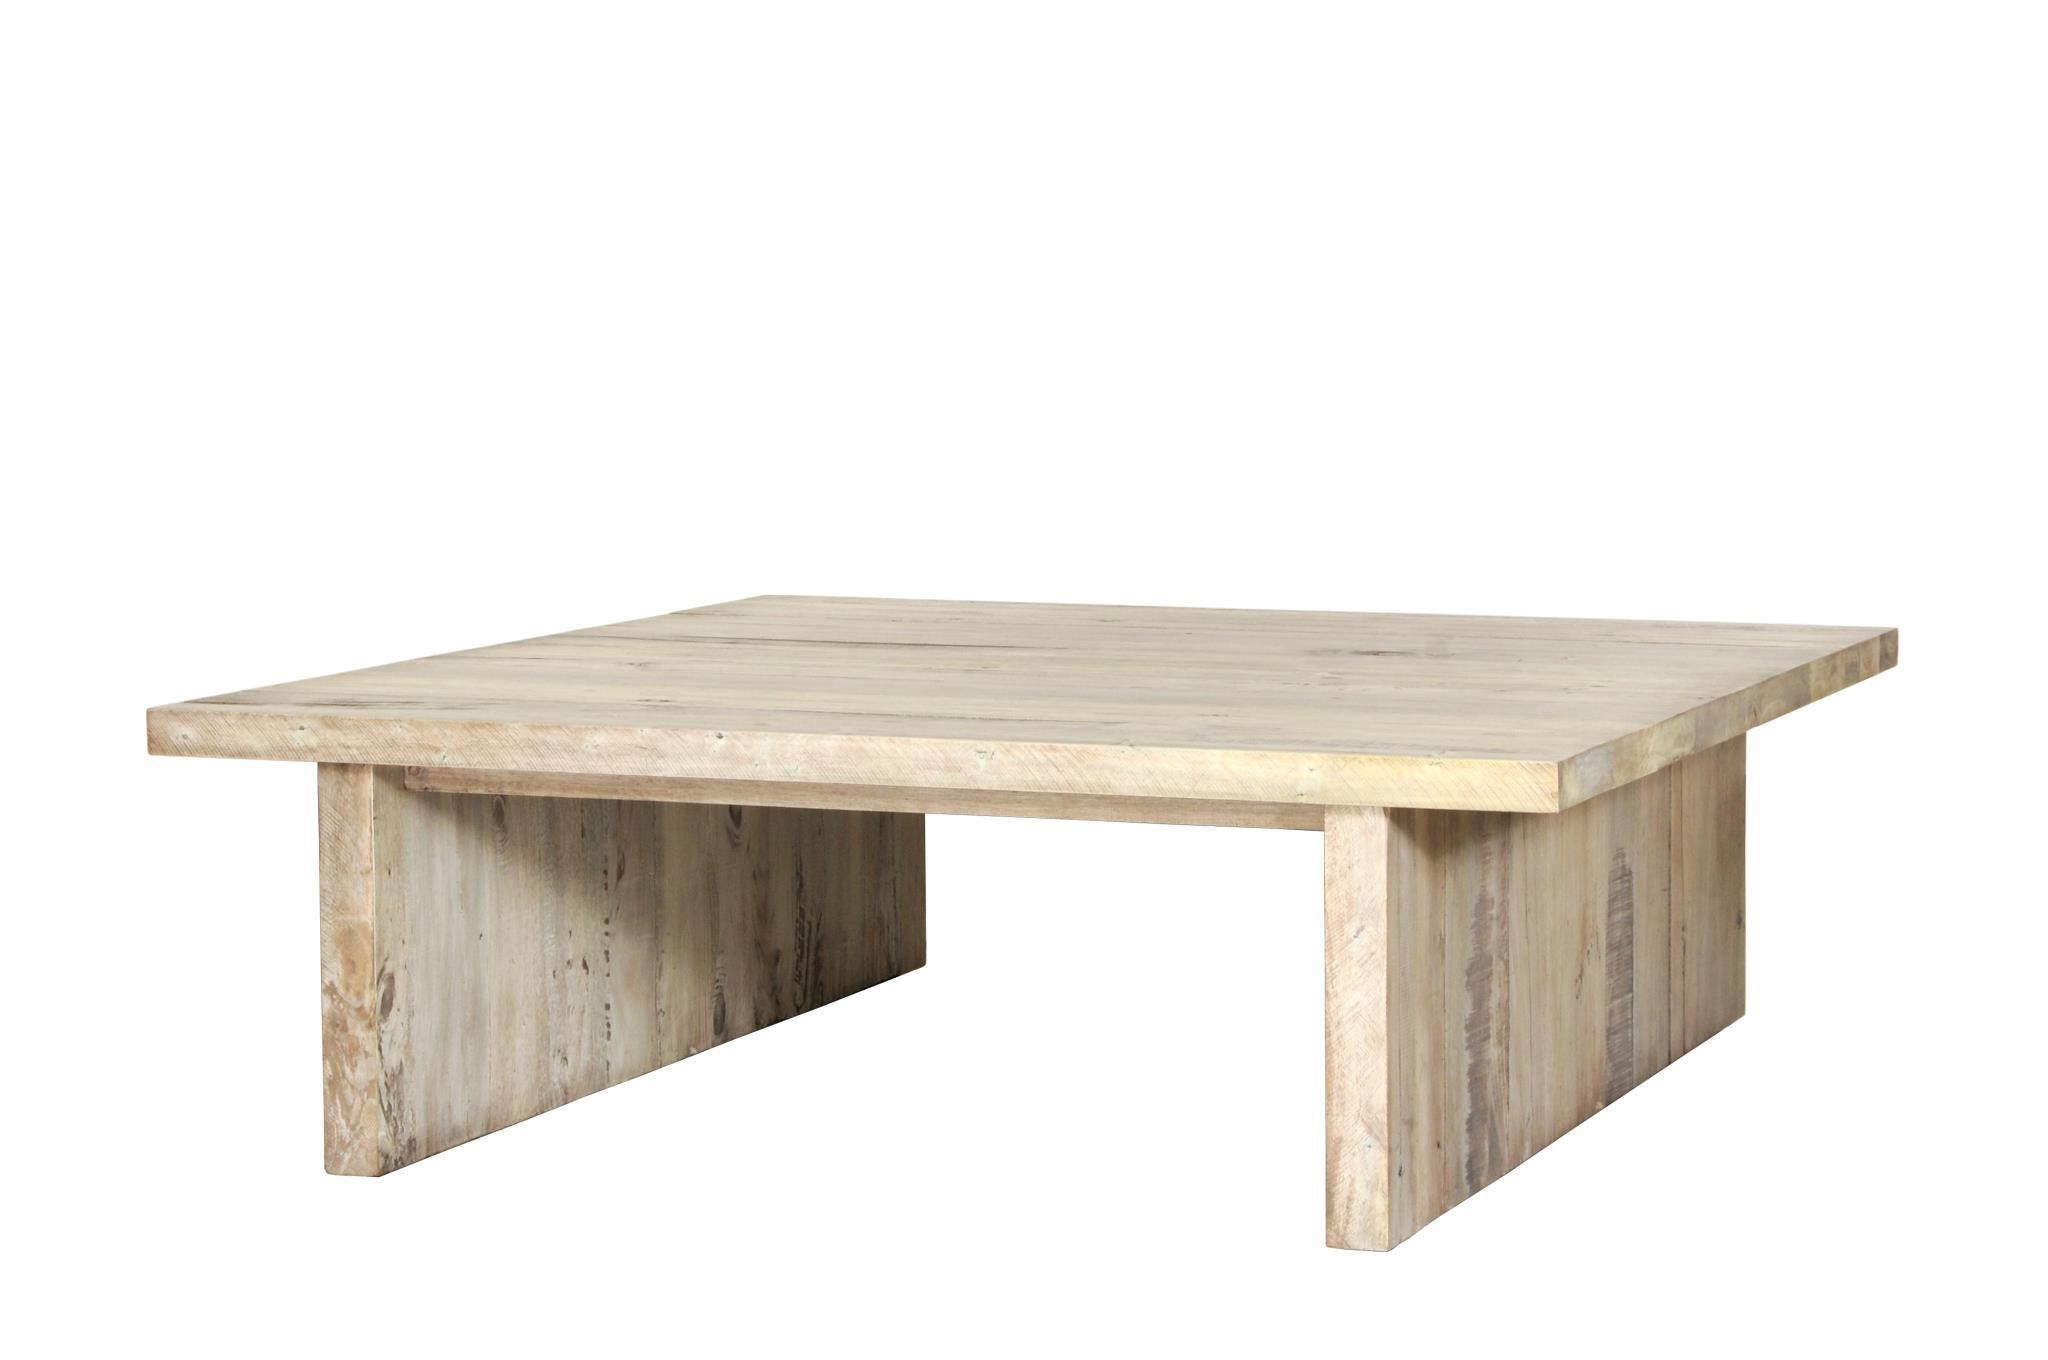 Renewal Coffee Table by Napa Furniture Designs at HomeWorld Furniture